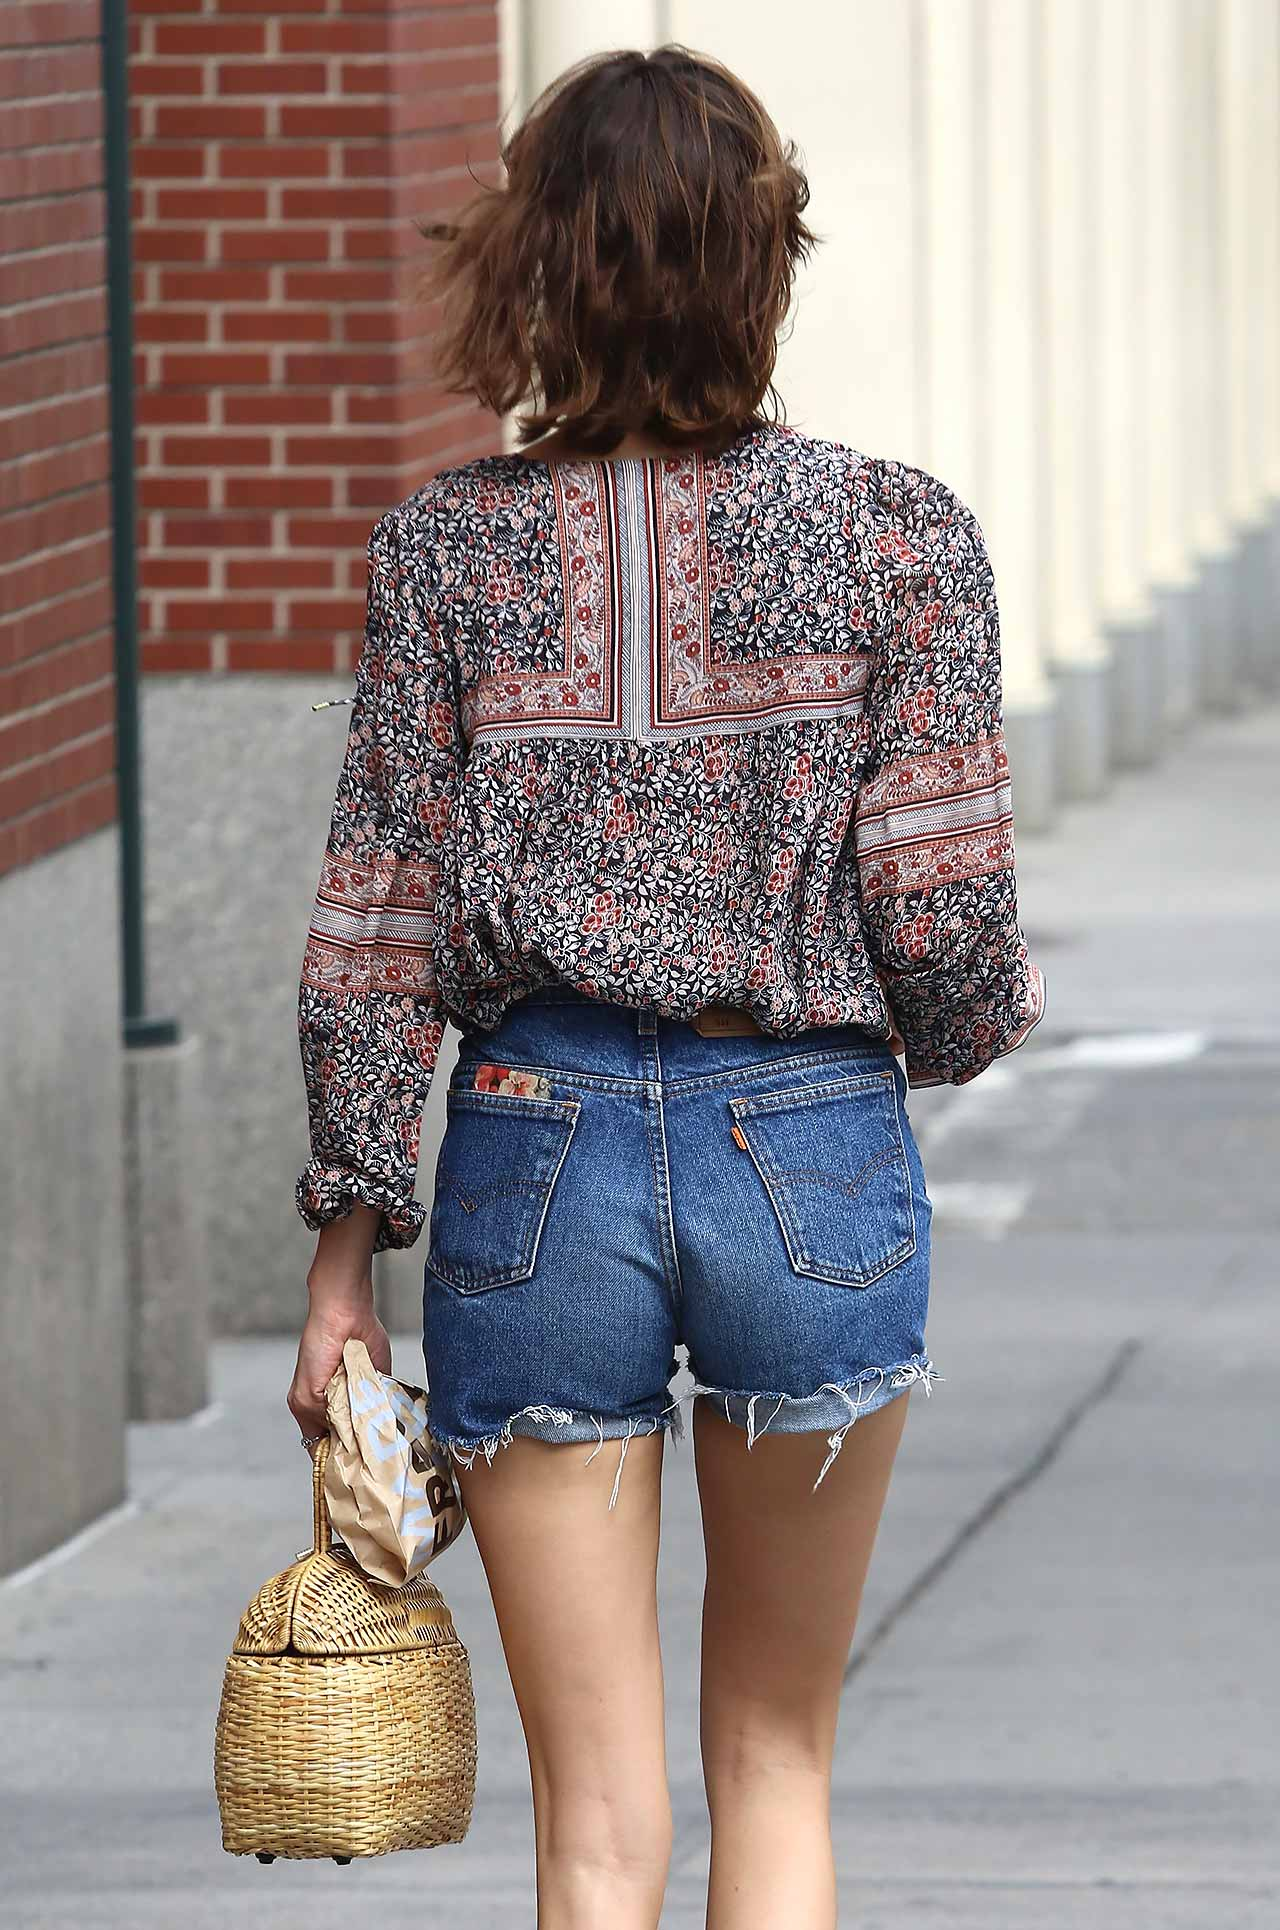 Alexa Chung Wears Vintage Leviu0026#39;s Denim Shorts | The Jeans Blog